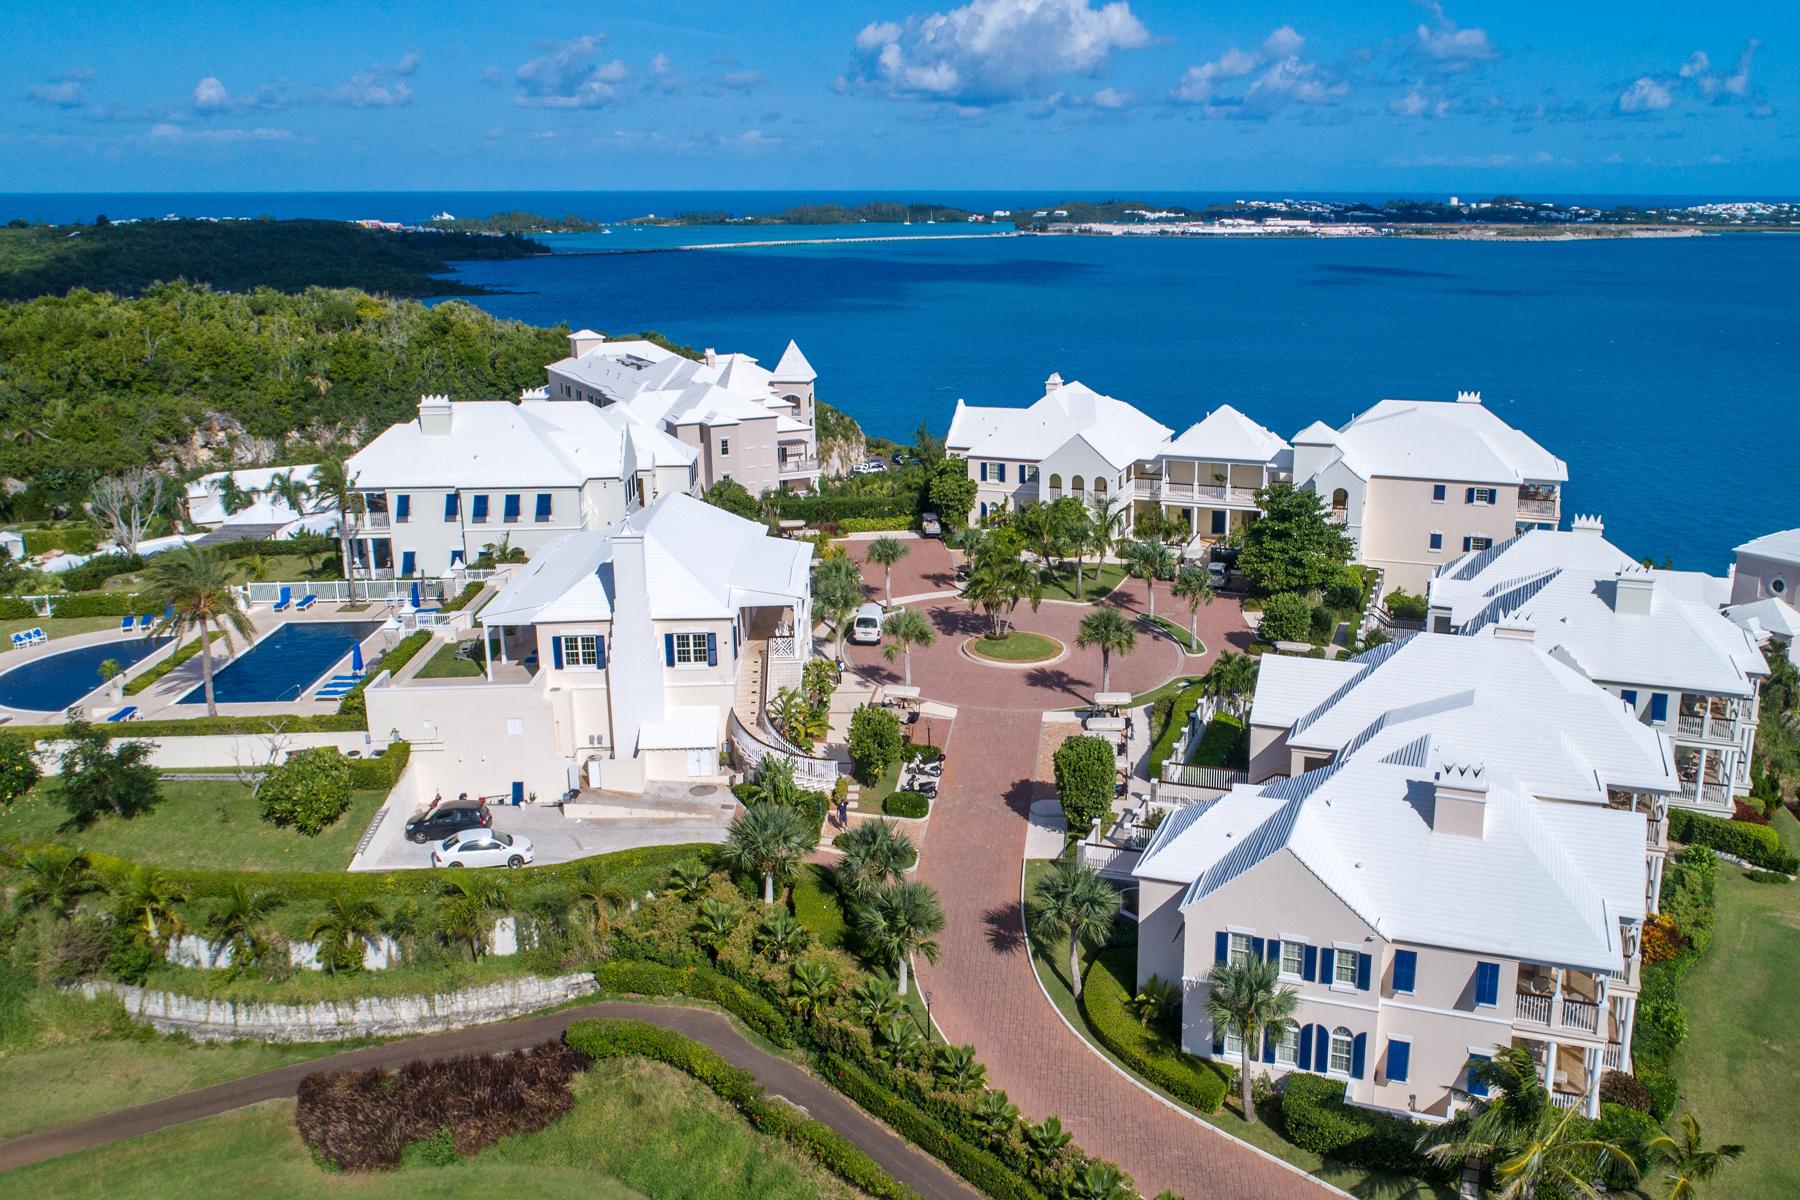 Fractional Ownership Properties for Active at Tucker's Point Golf Villa - 3 Bedroom St Georges Parish, Bermuda Bermuda